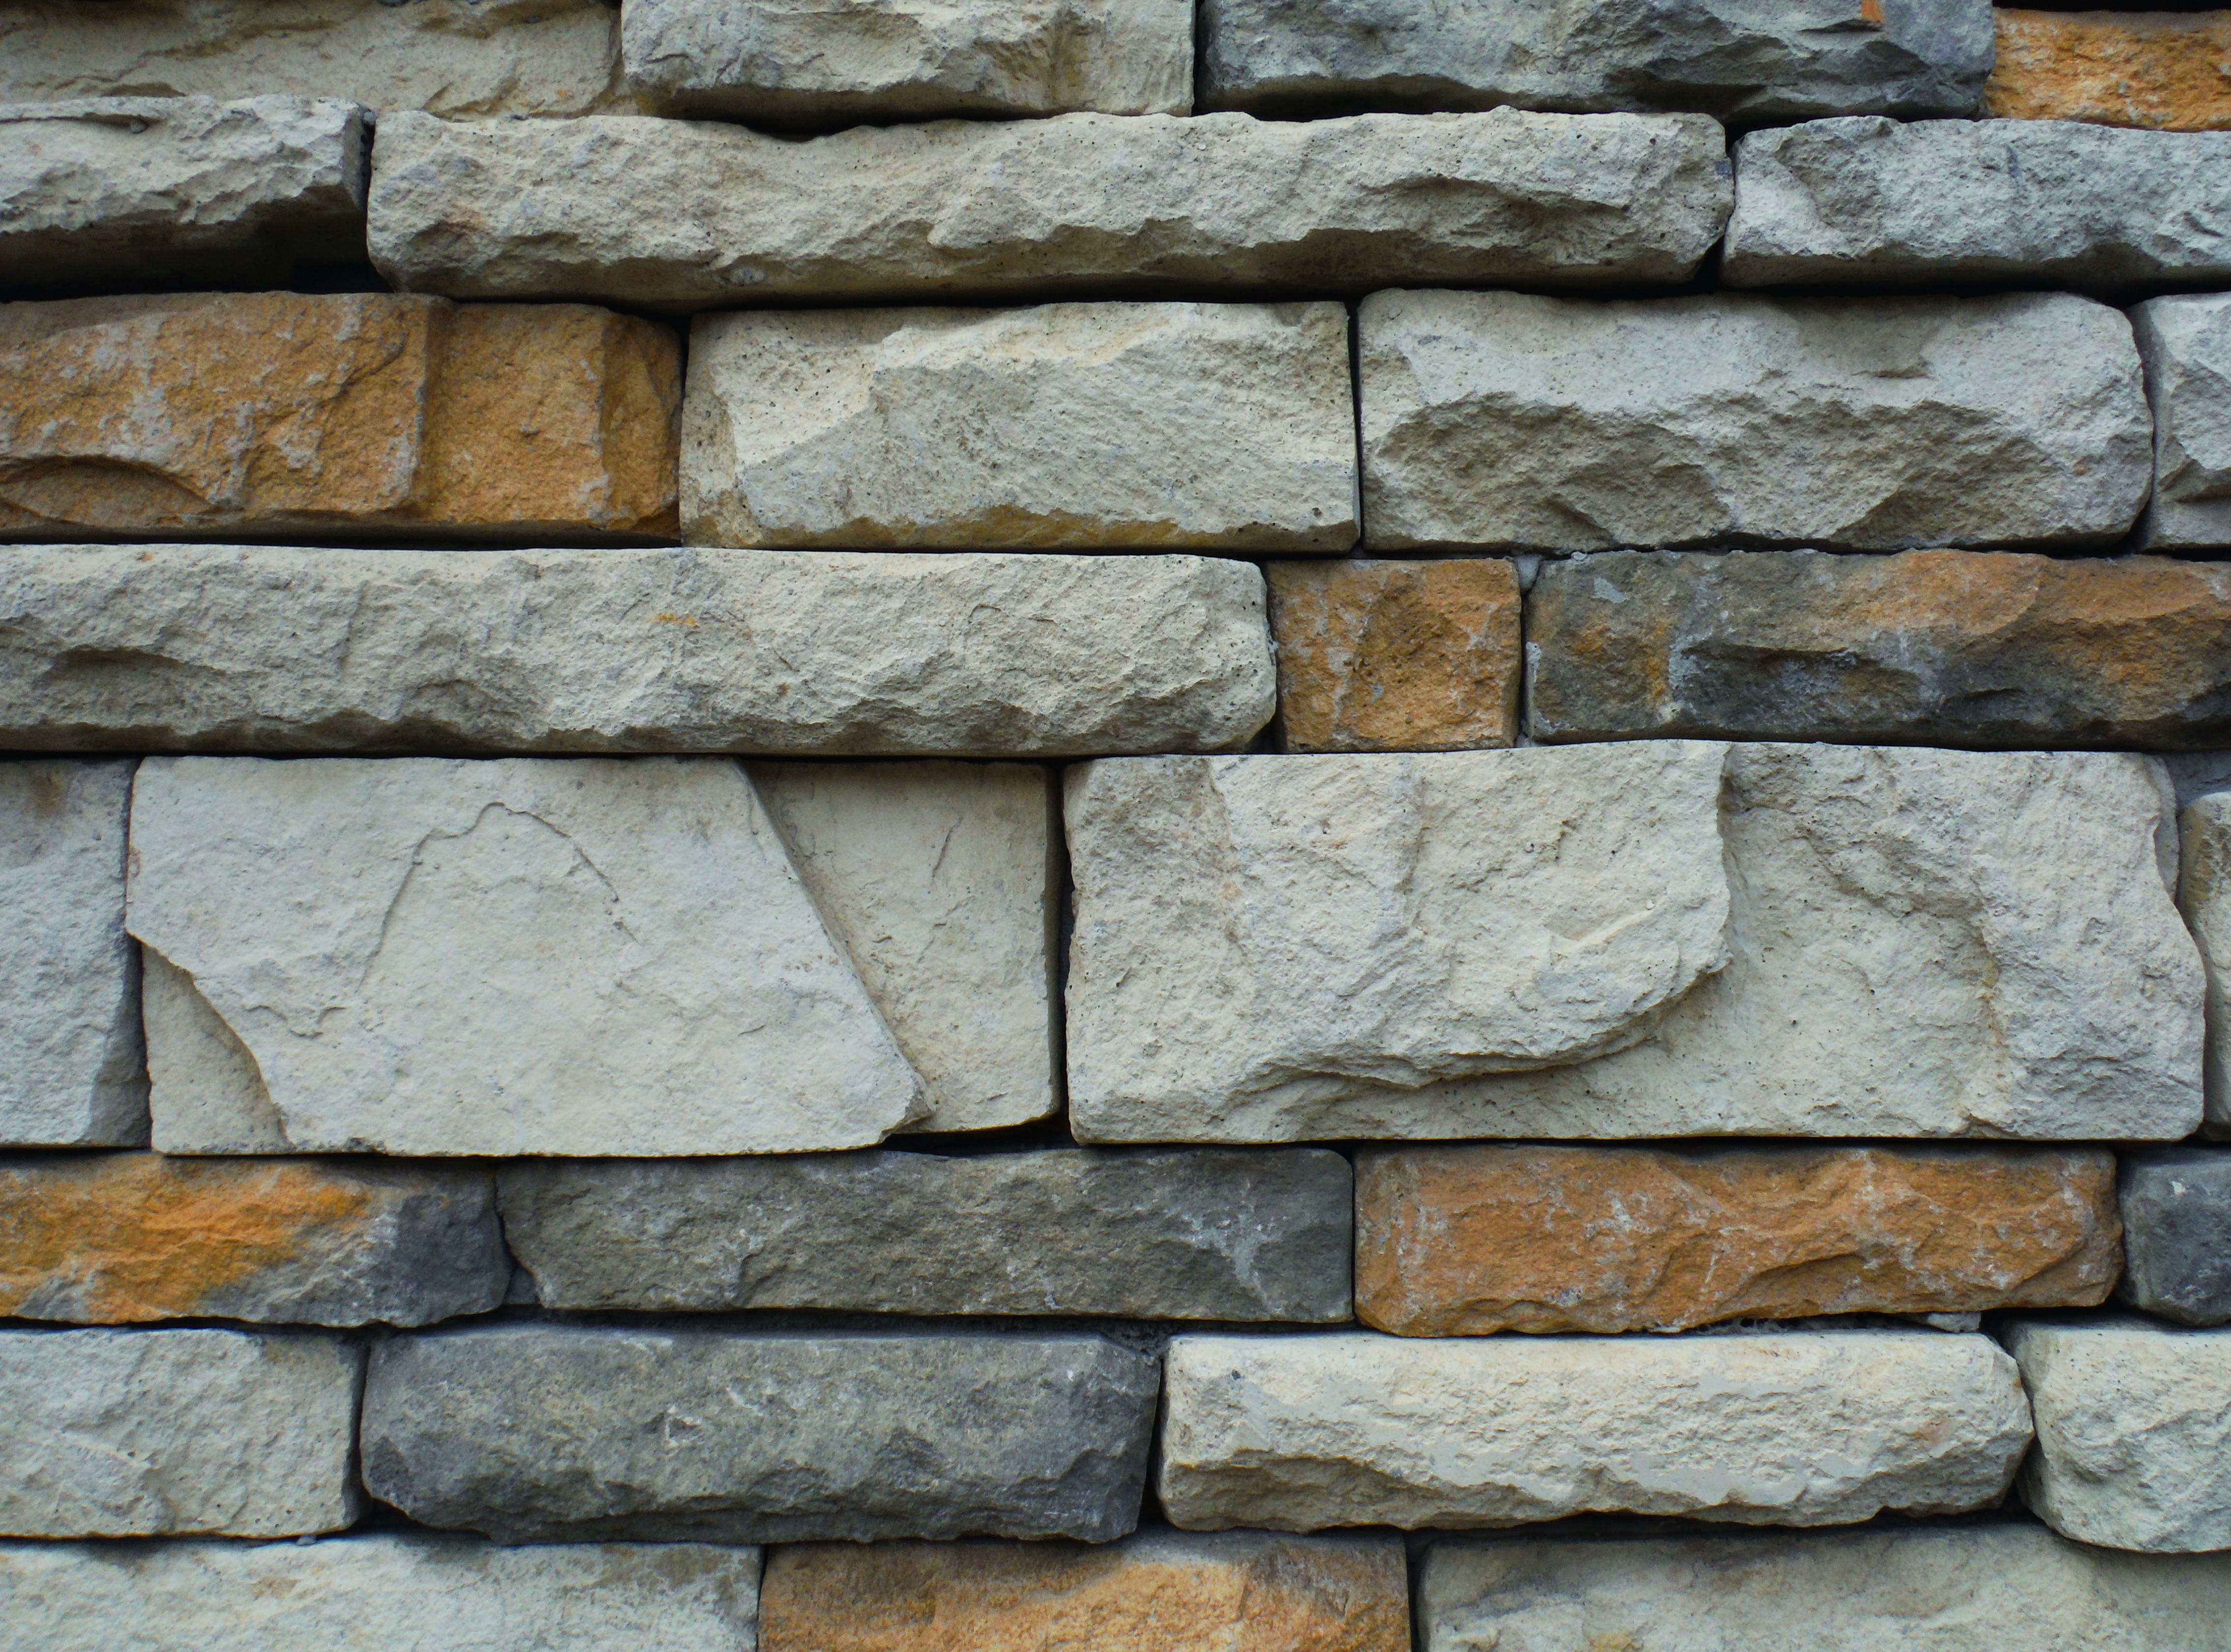 amb textura, aparell d'un mur, arquitectura